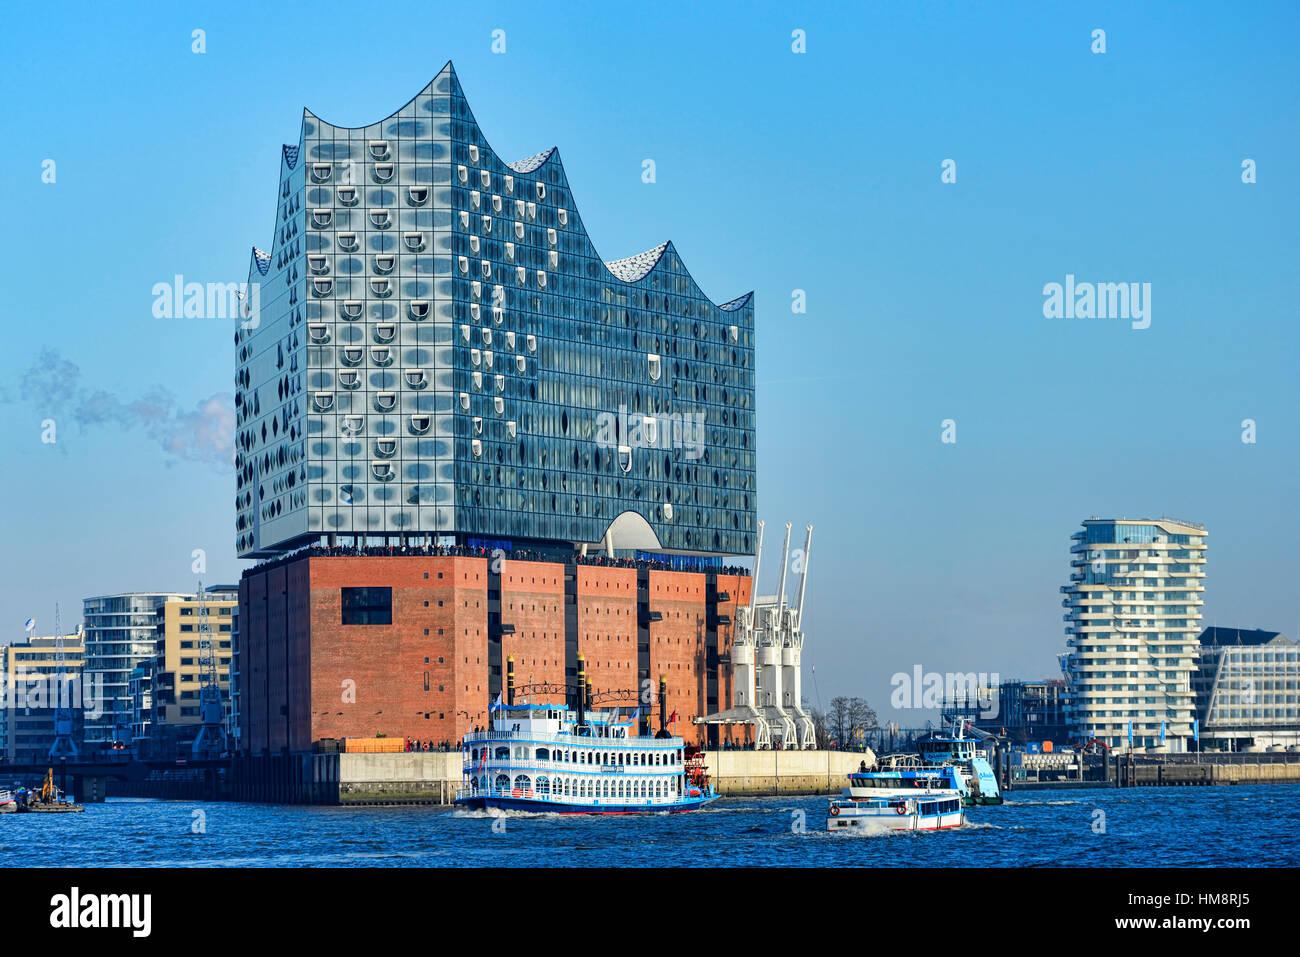 Elbe Philharmonic Hall Elbphilharmonie in Hamburg, Germany Stock Photo